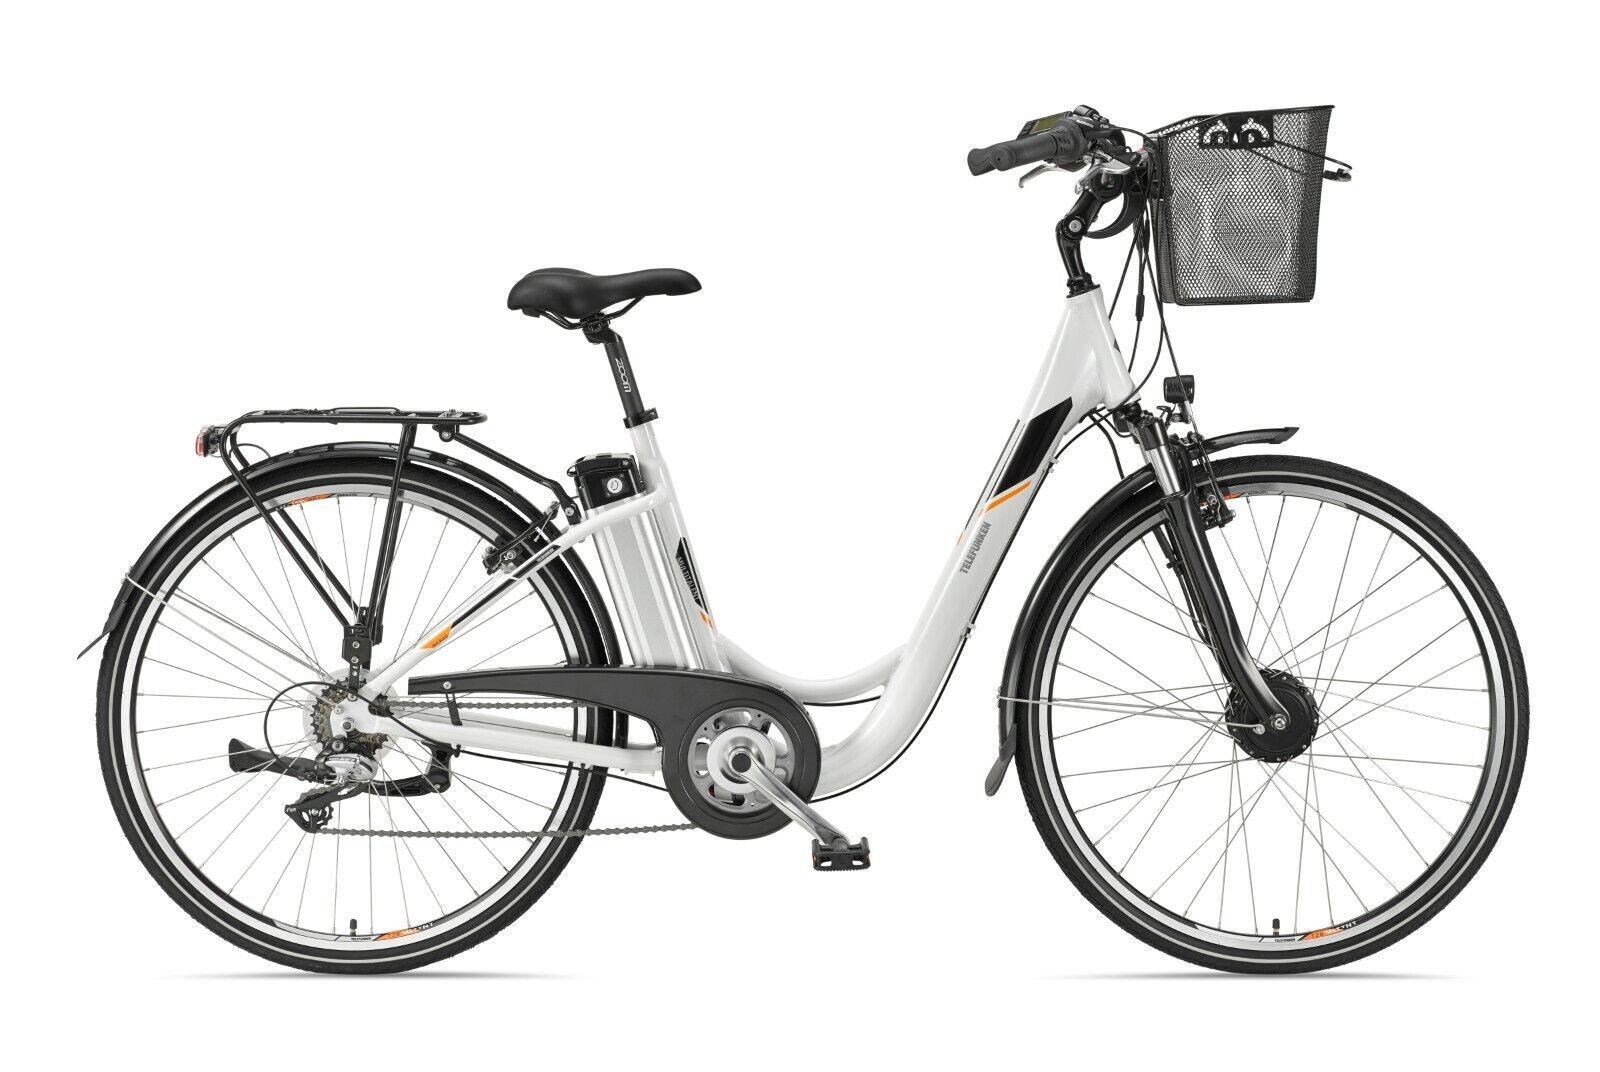 Telefunken E-Bike 28 Zoll Elektrofahrrad Citybike 7-Gang Kette RC820 Multitalent